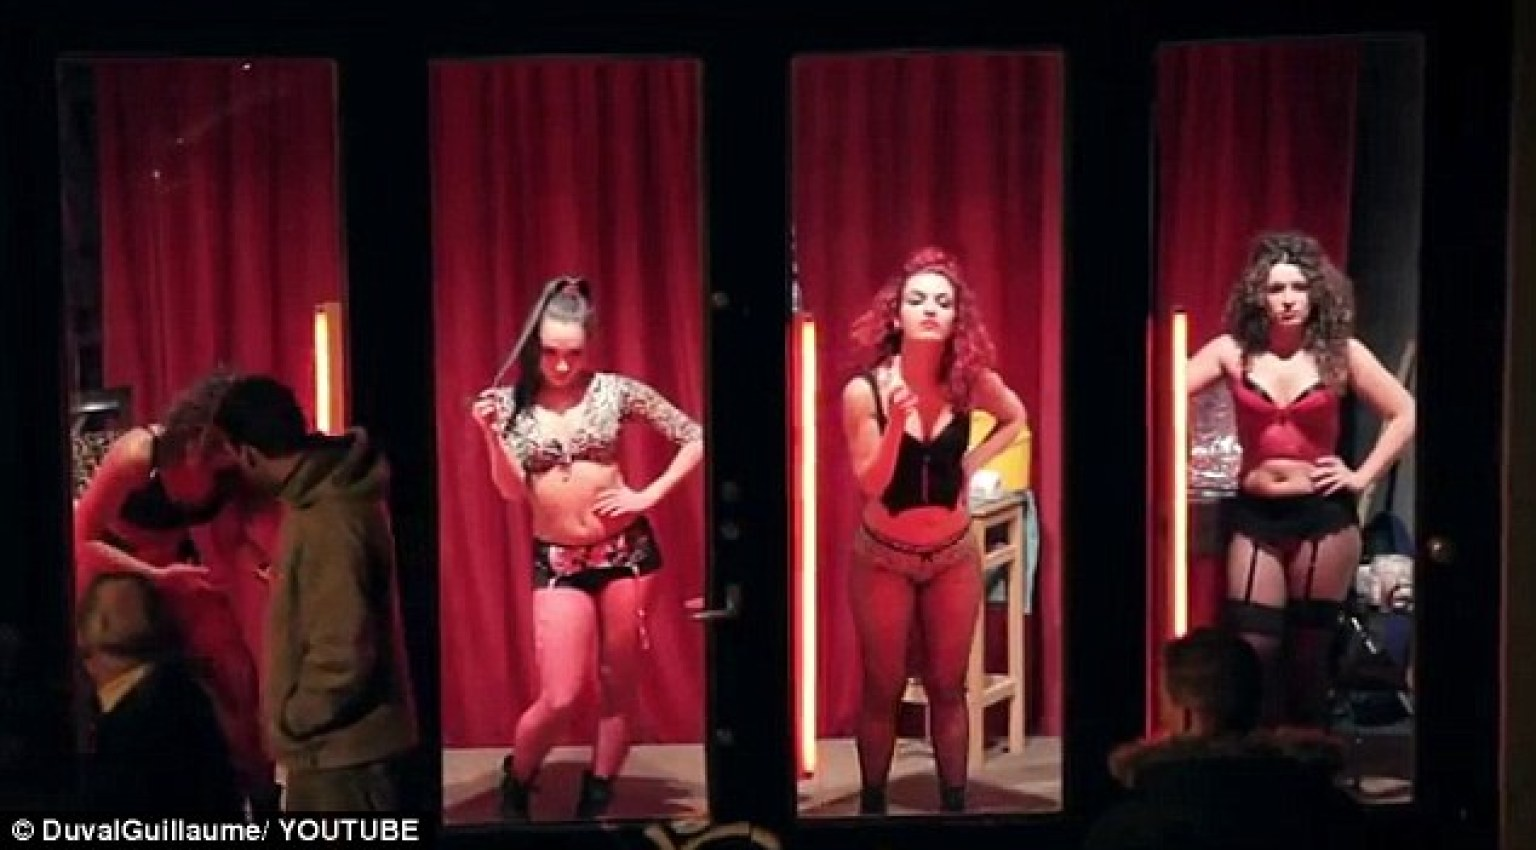 vetrina rossa perugia ragazzi escort gay